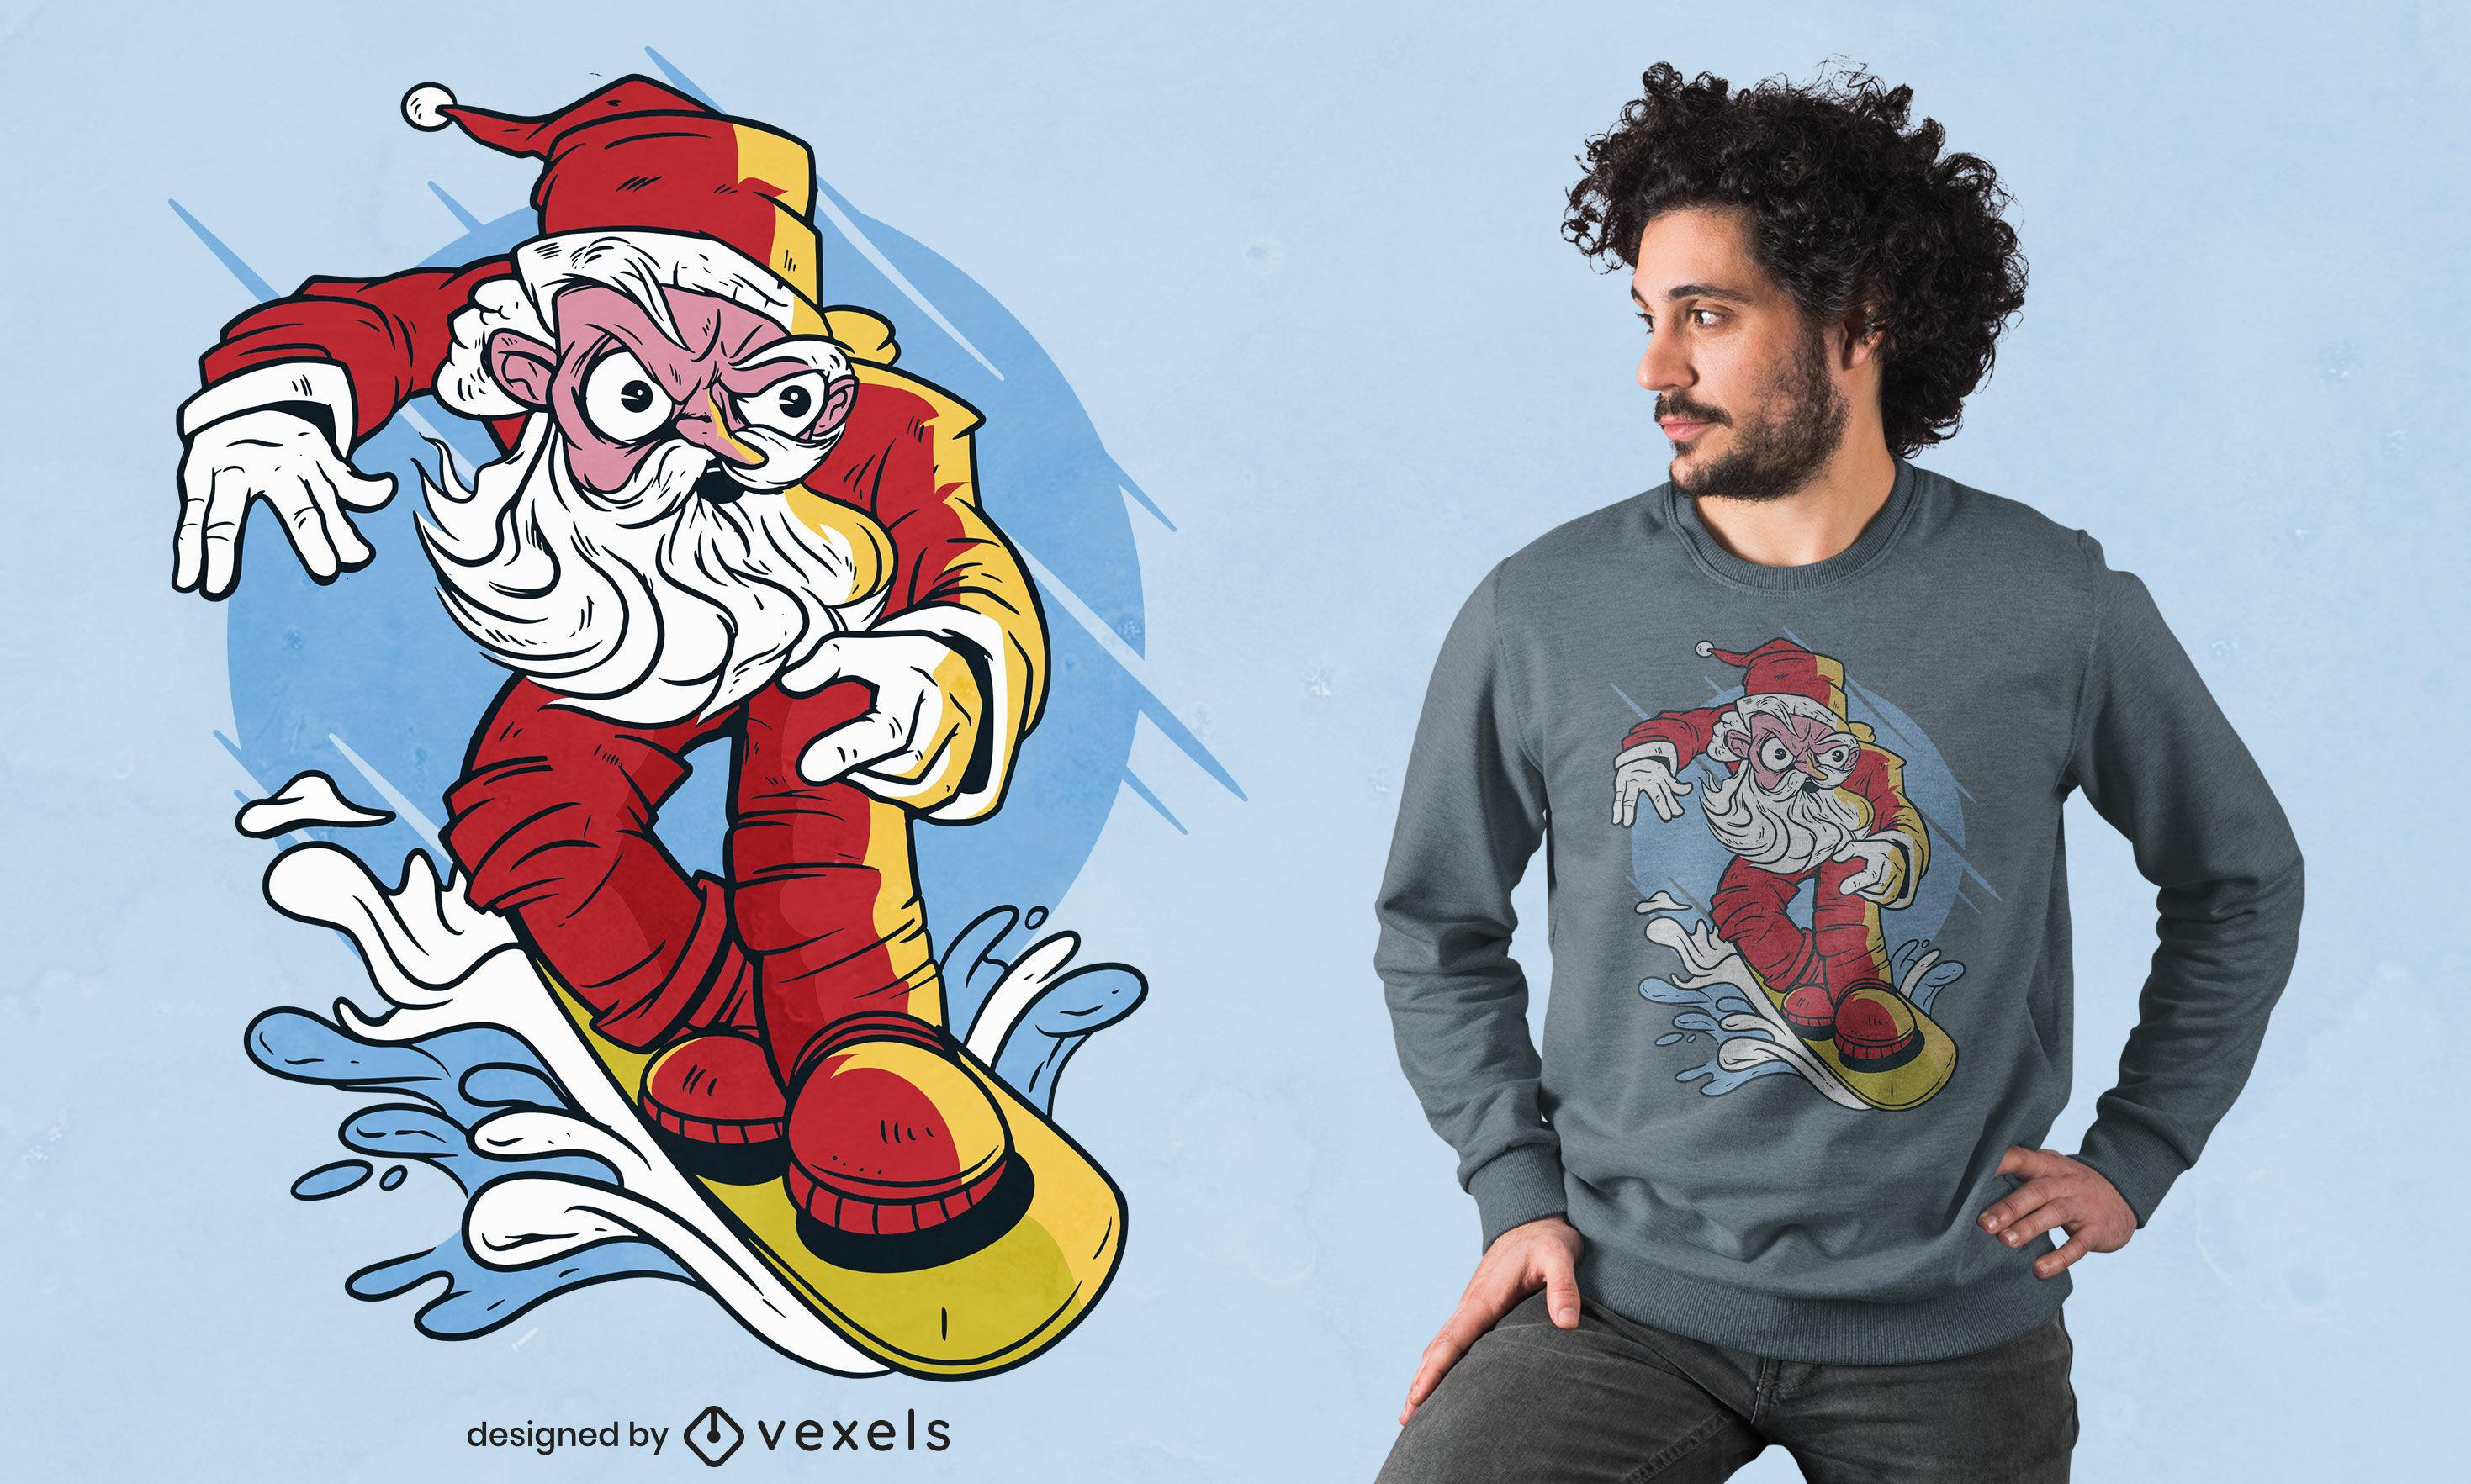 Santa Claus snowboarding t-shirt design